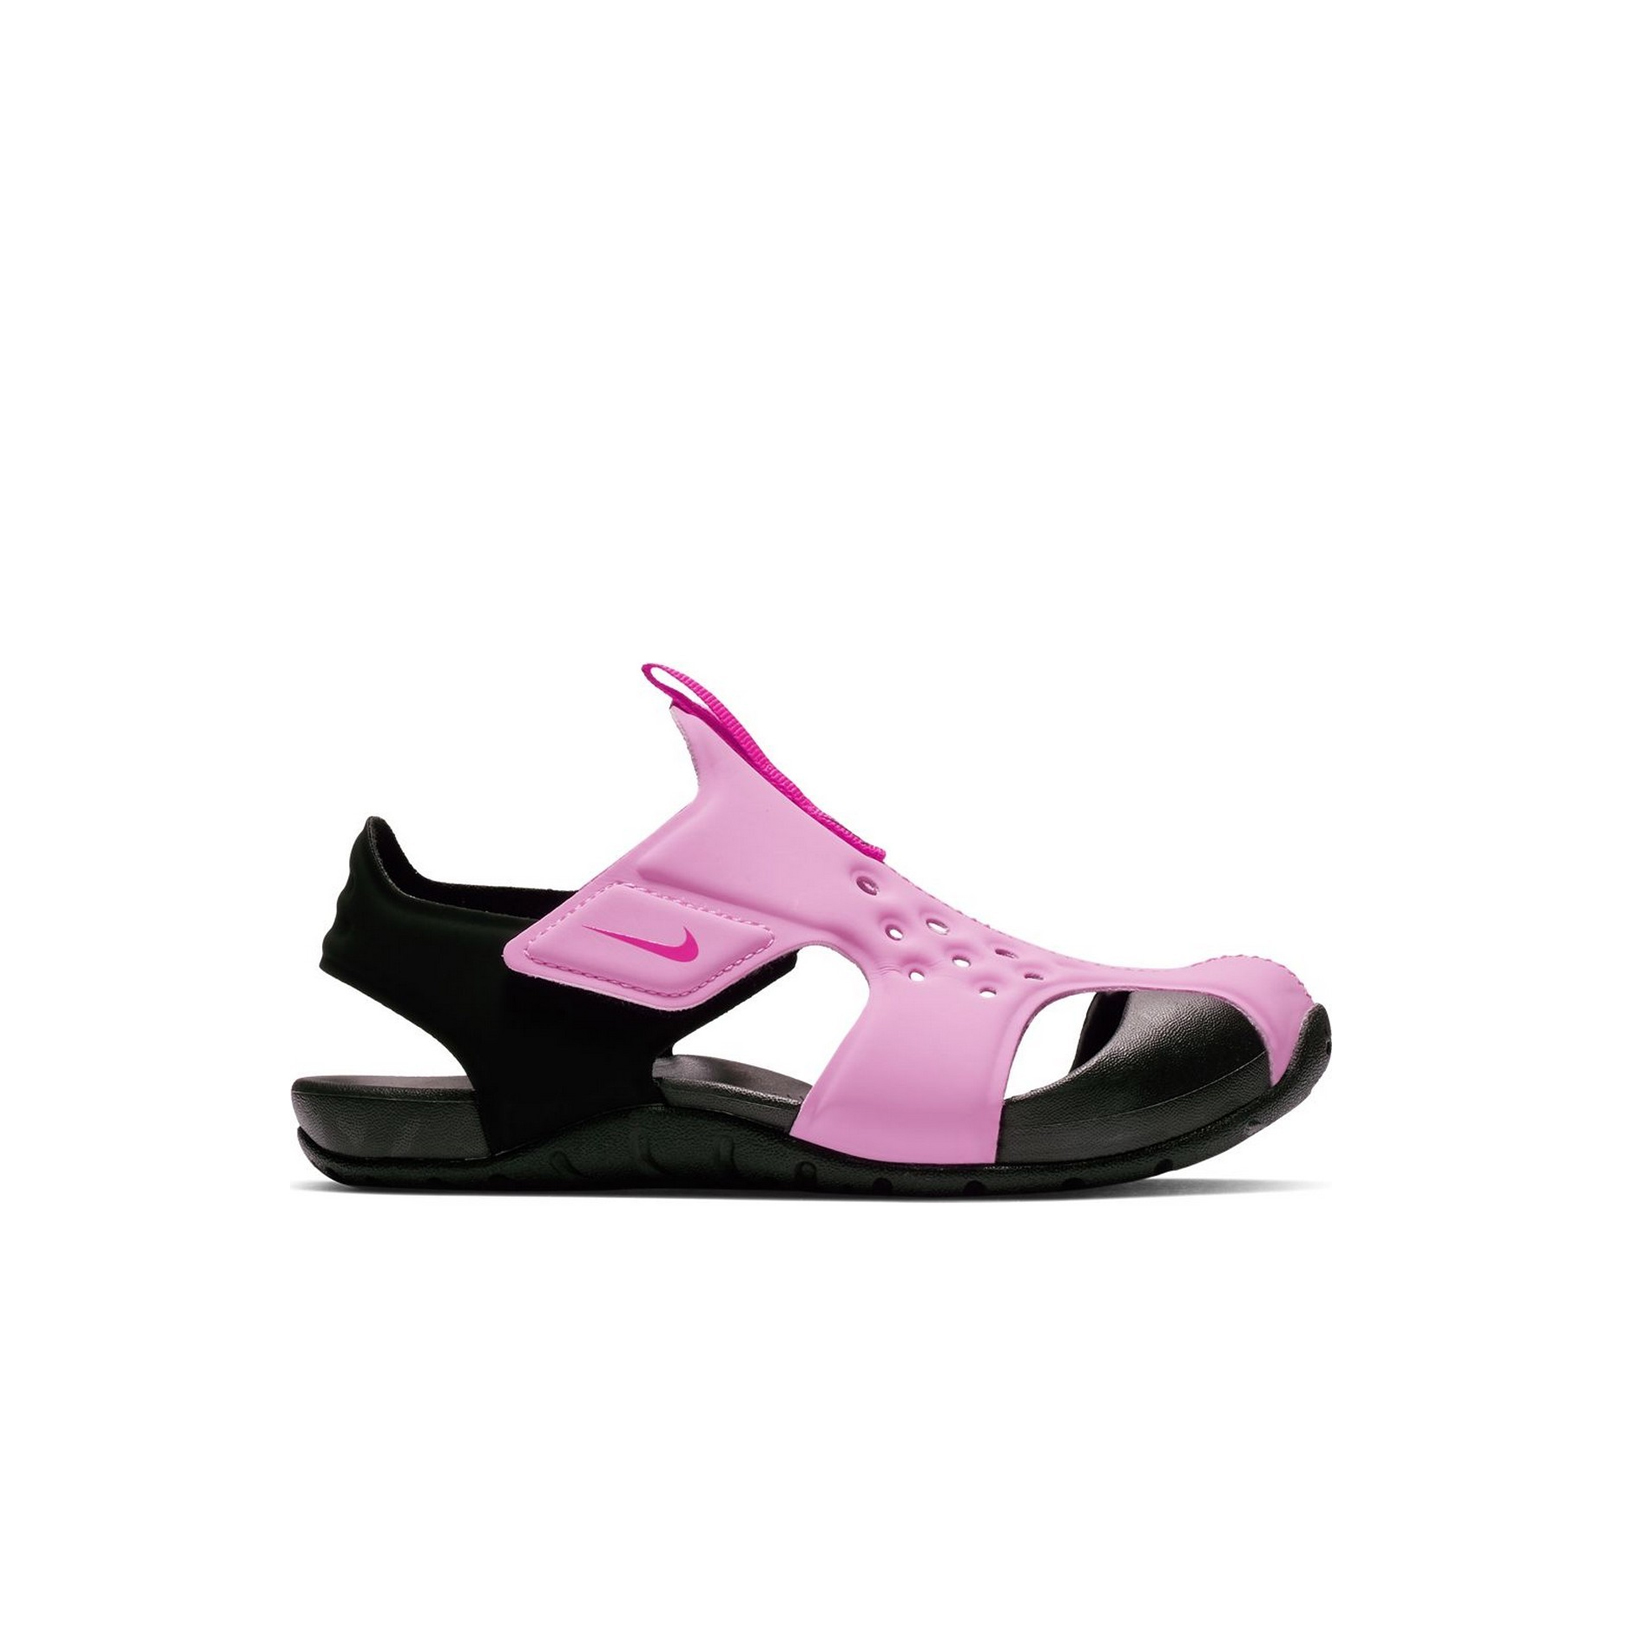 Nike Sunray Protect 2 Sandal Ps Pink - Black